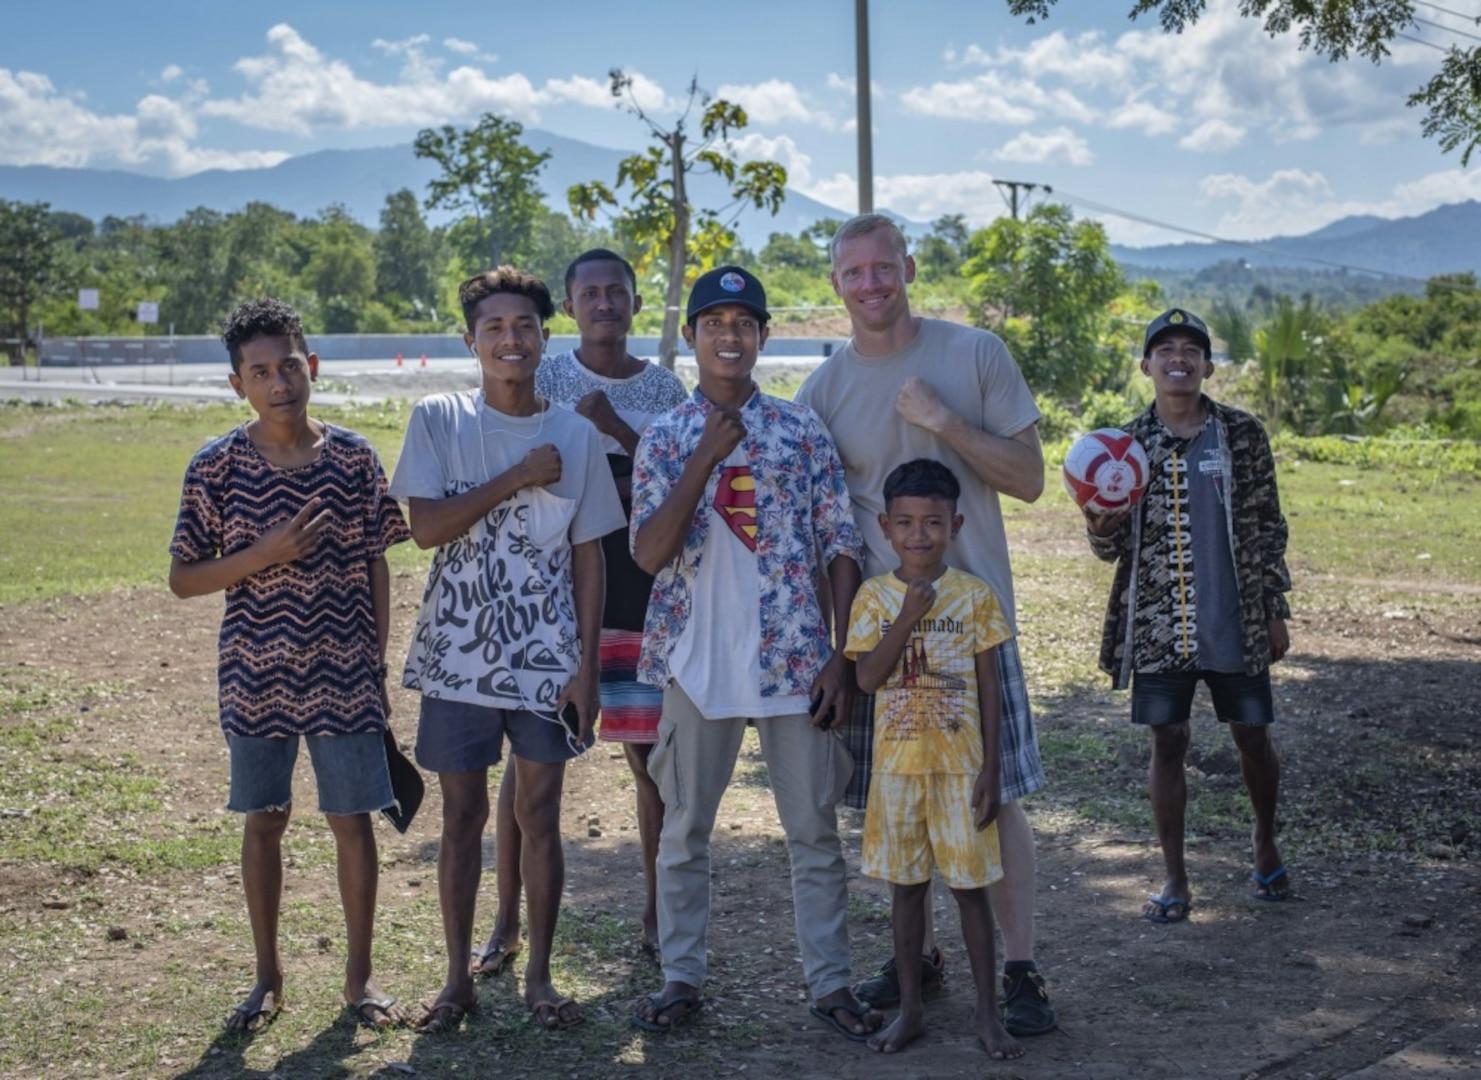 Pacific Angel 18-1 Unsung Heroes Enabled Medics, Engineers in Timor-Leste